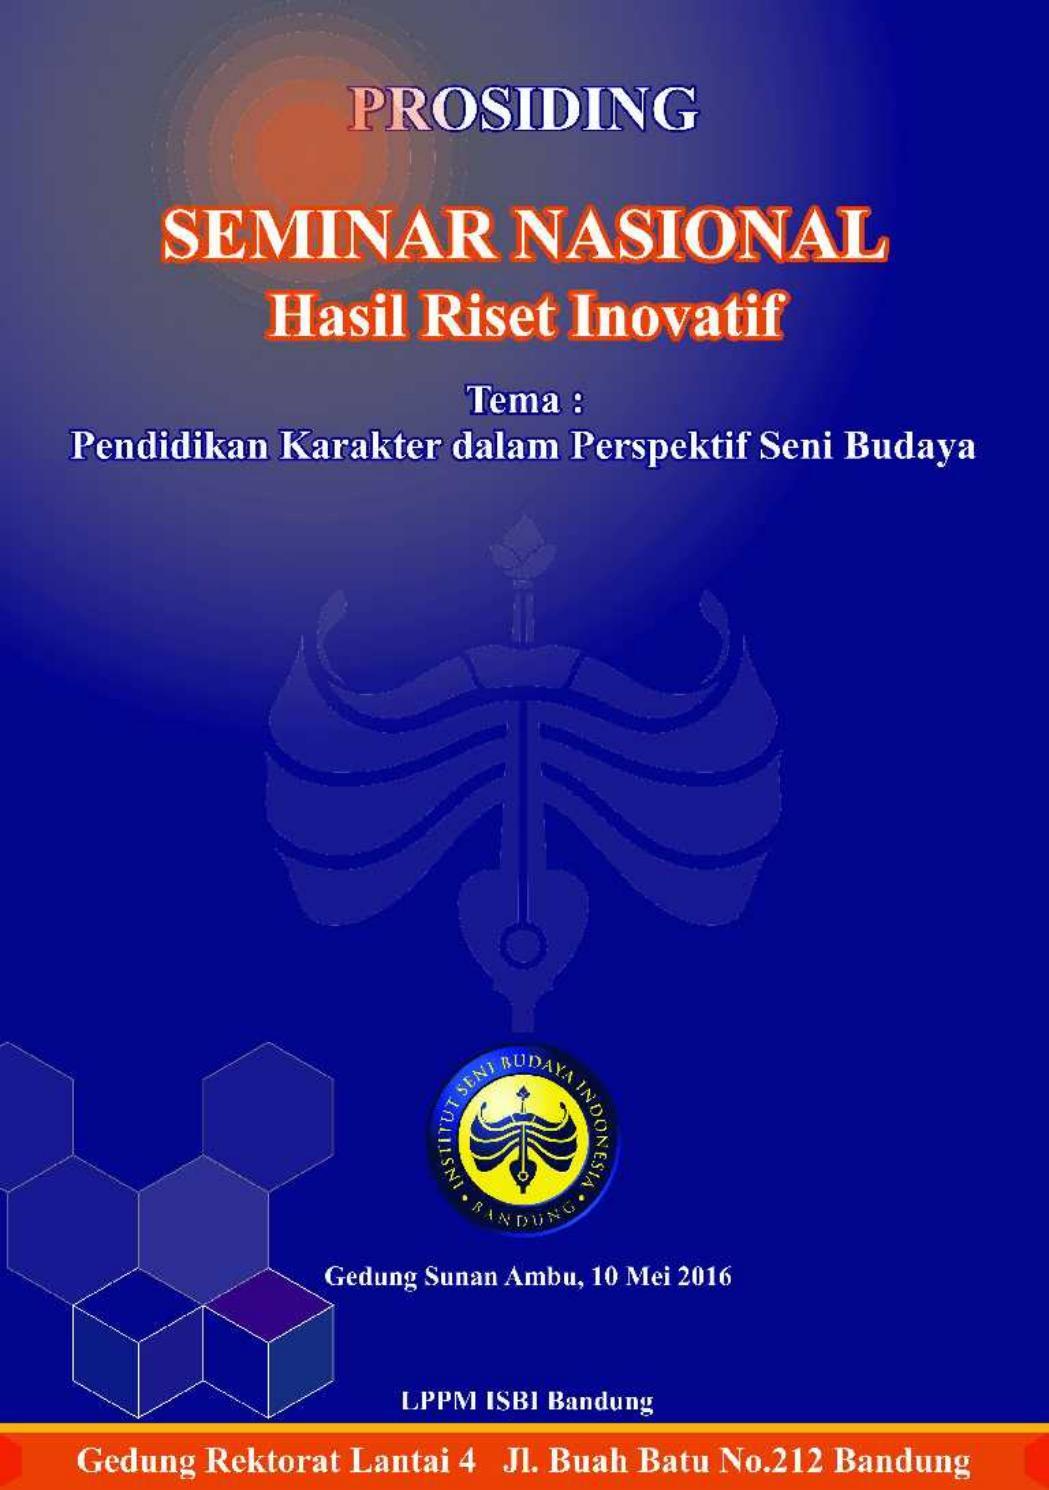 Prosiding Seminar Nasional Hasil Riset Inovatif Lppm Isbi